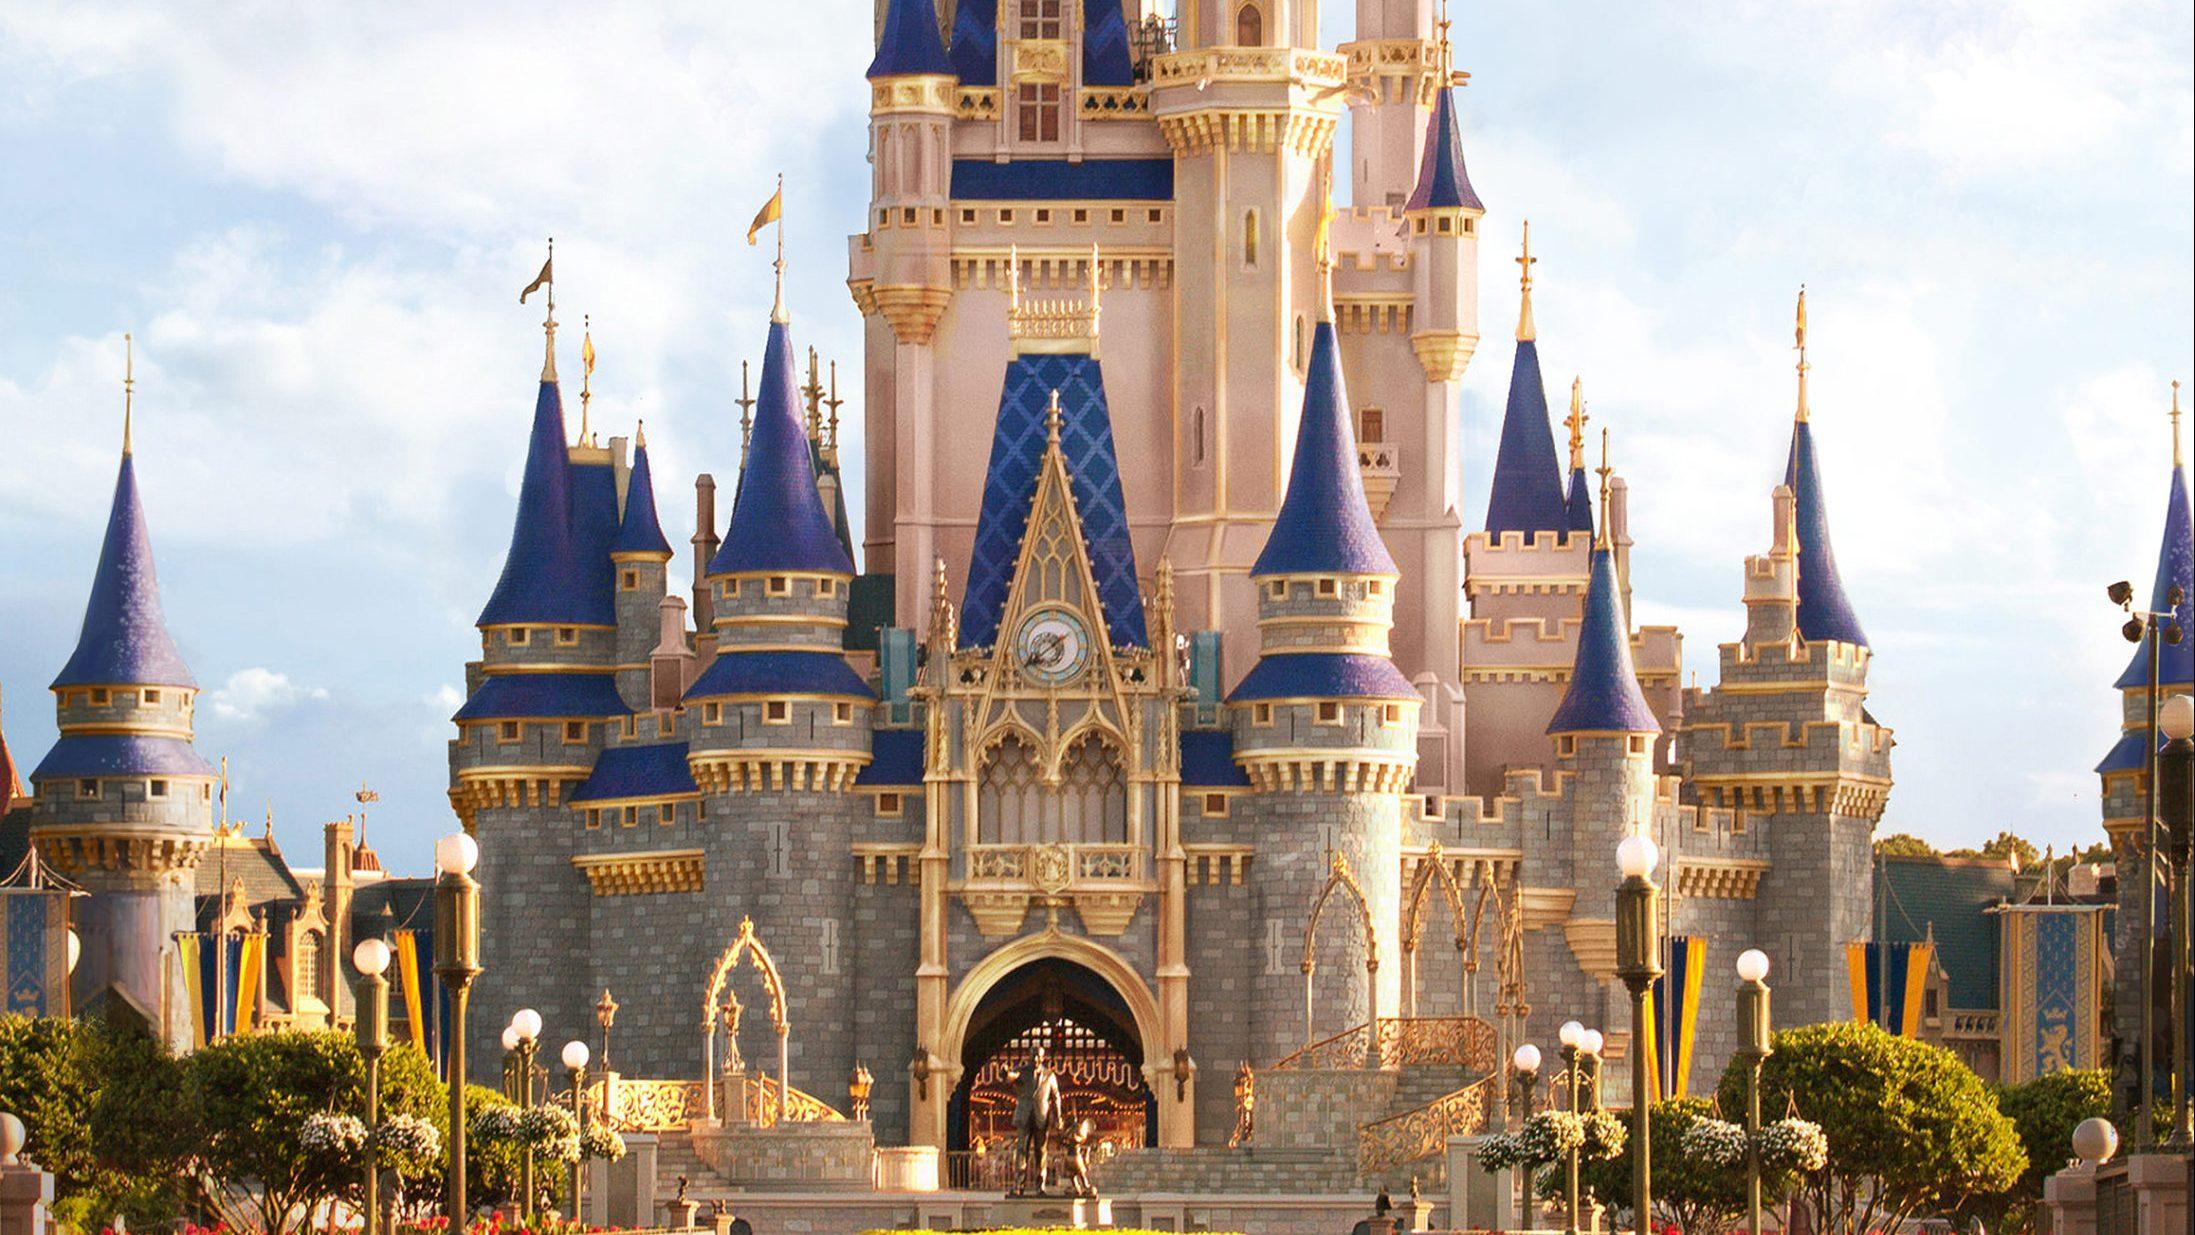 Walt Disney World's Cinderella Castle Is Getting a Makeover